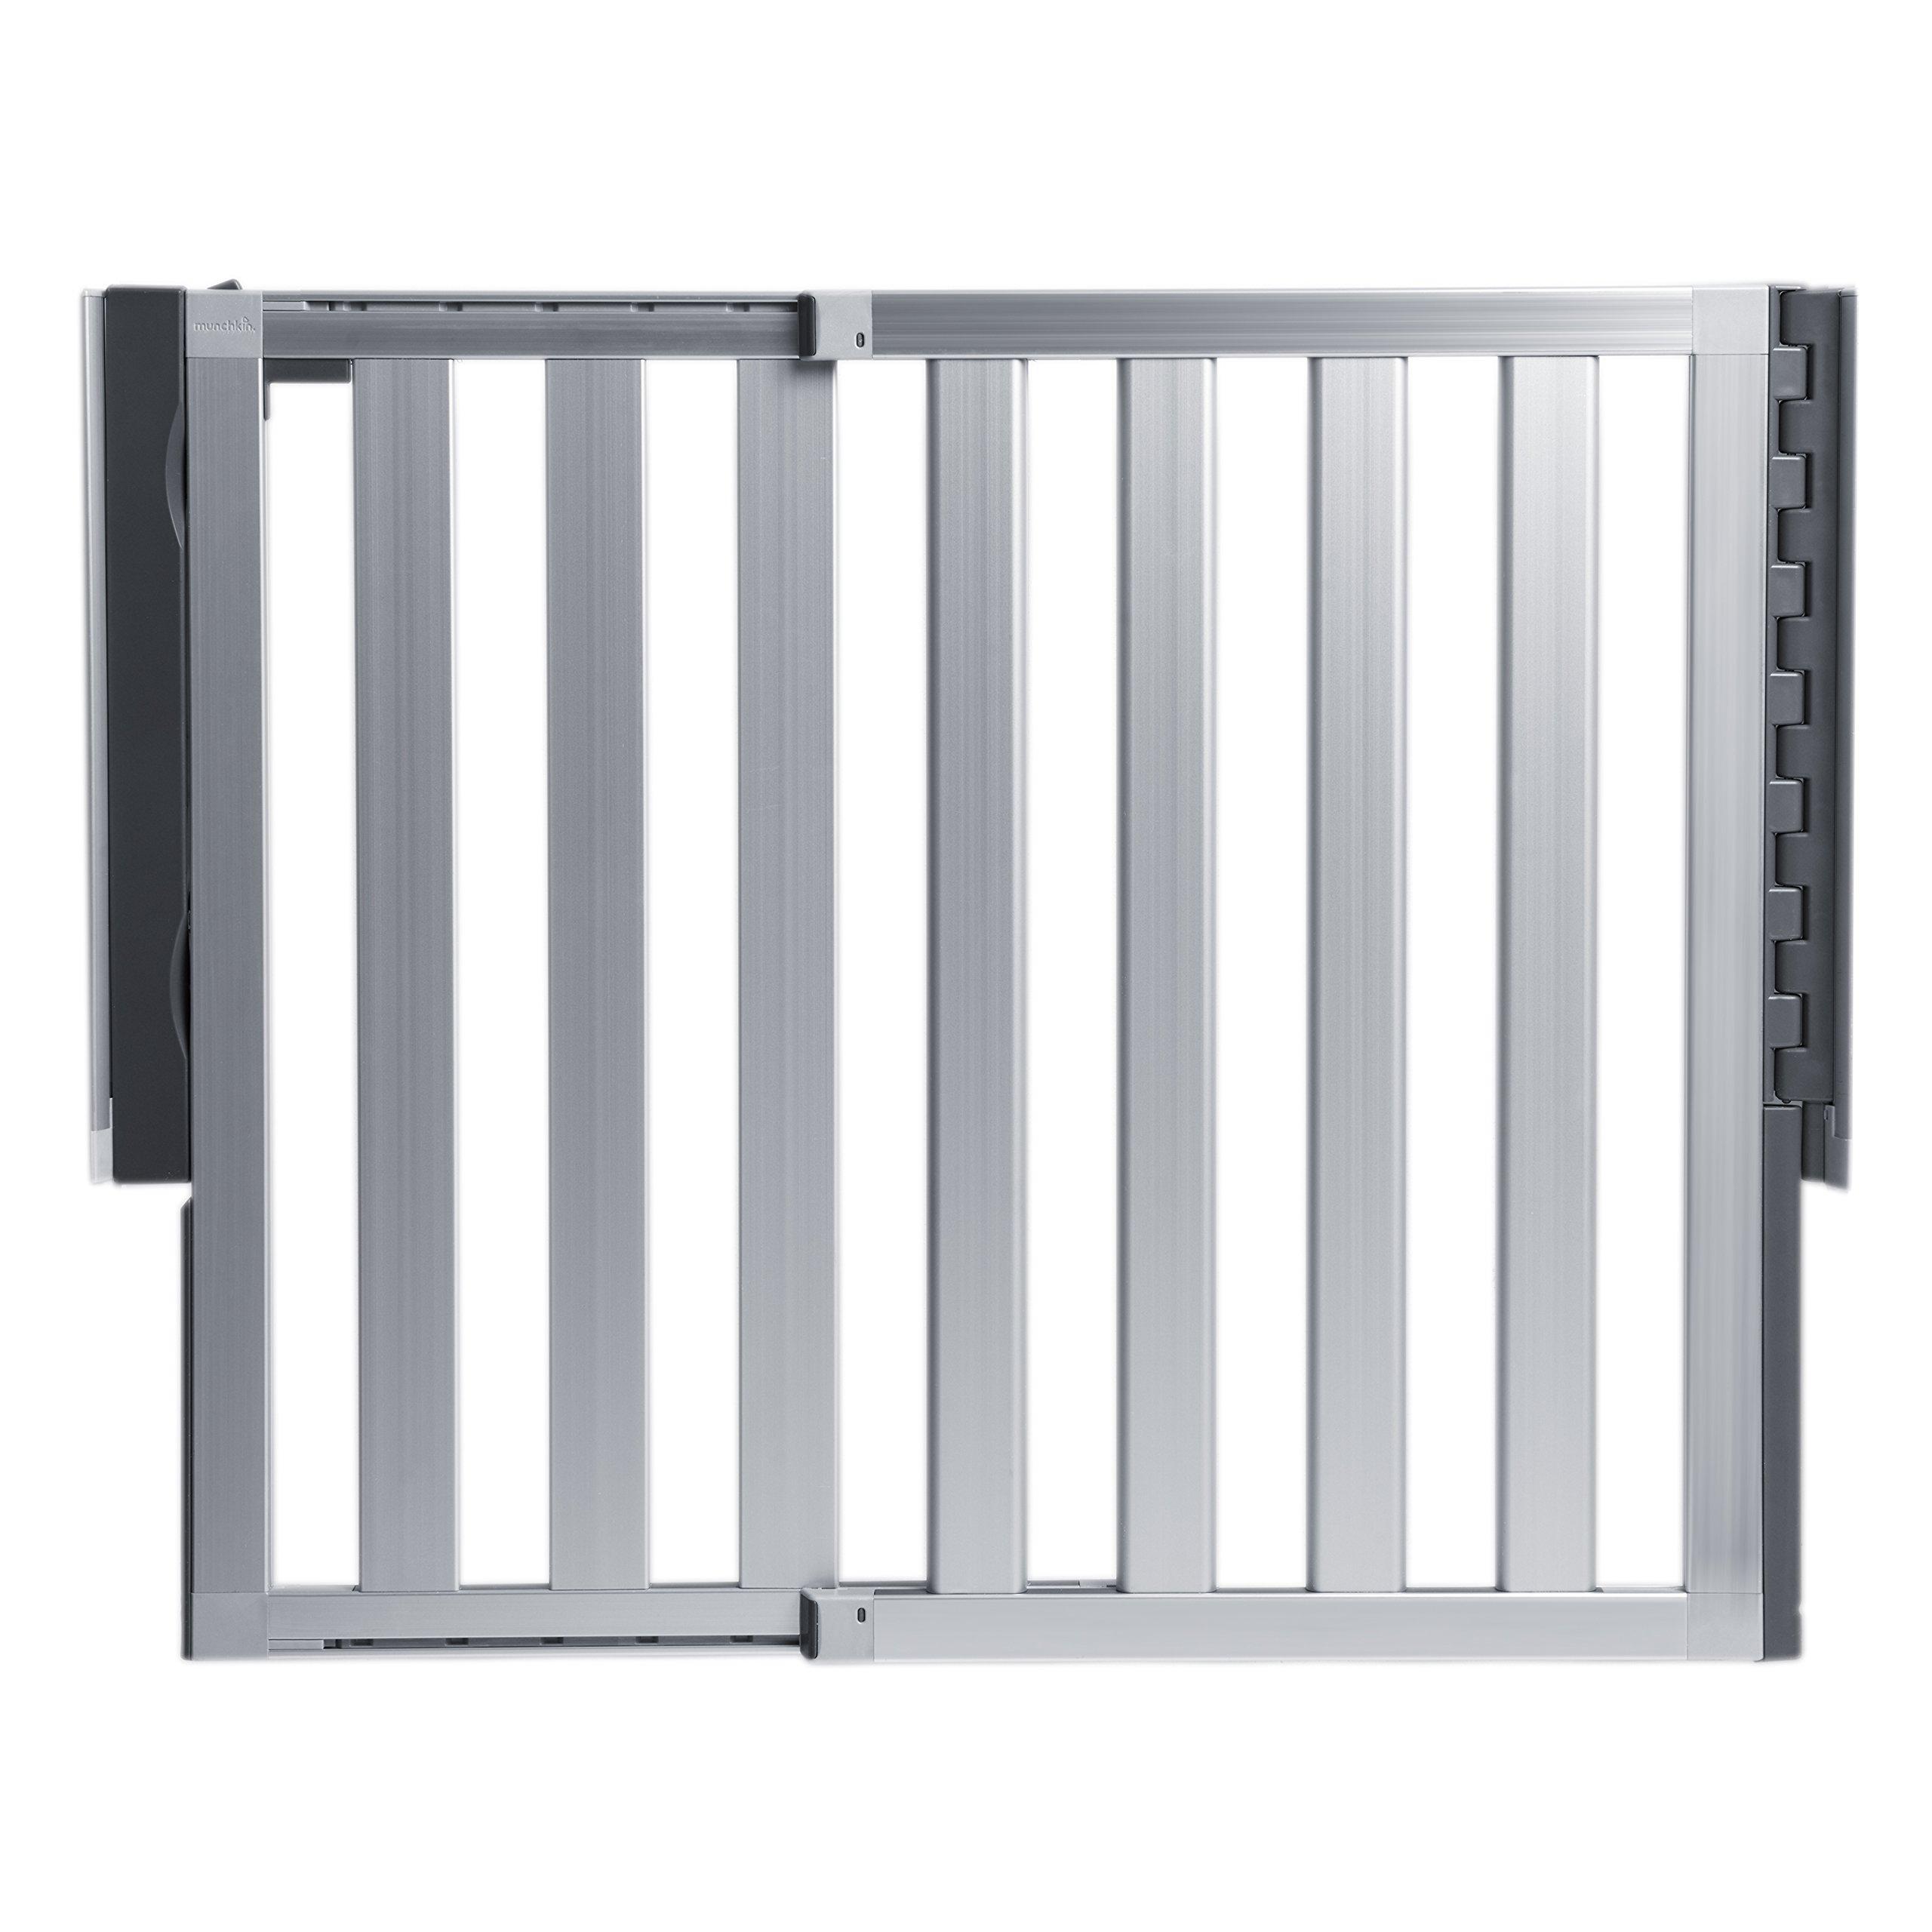 Munchkin Loft Aluminum Baby Gate, Silver by Munchkin